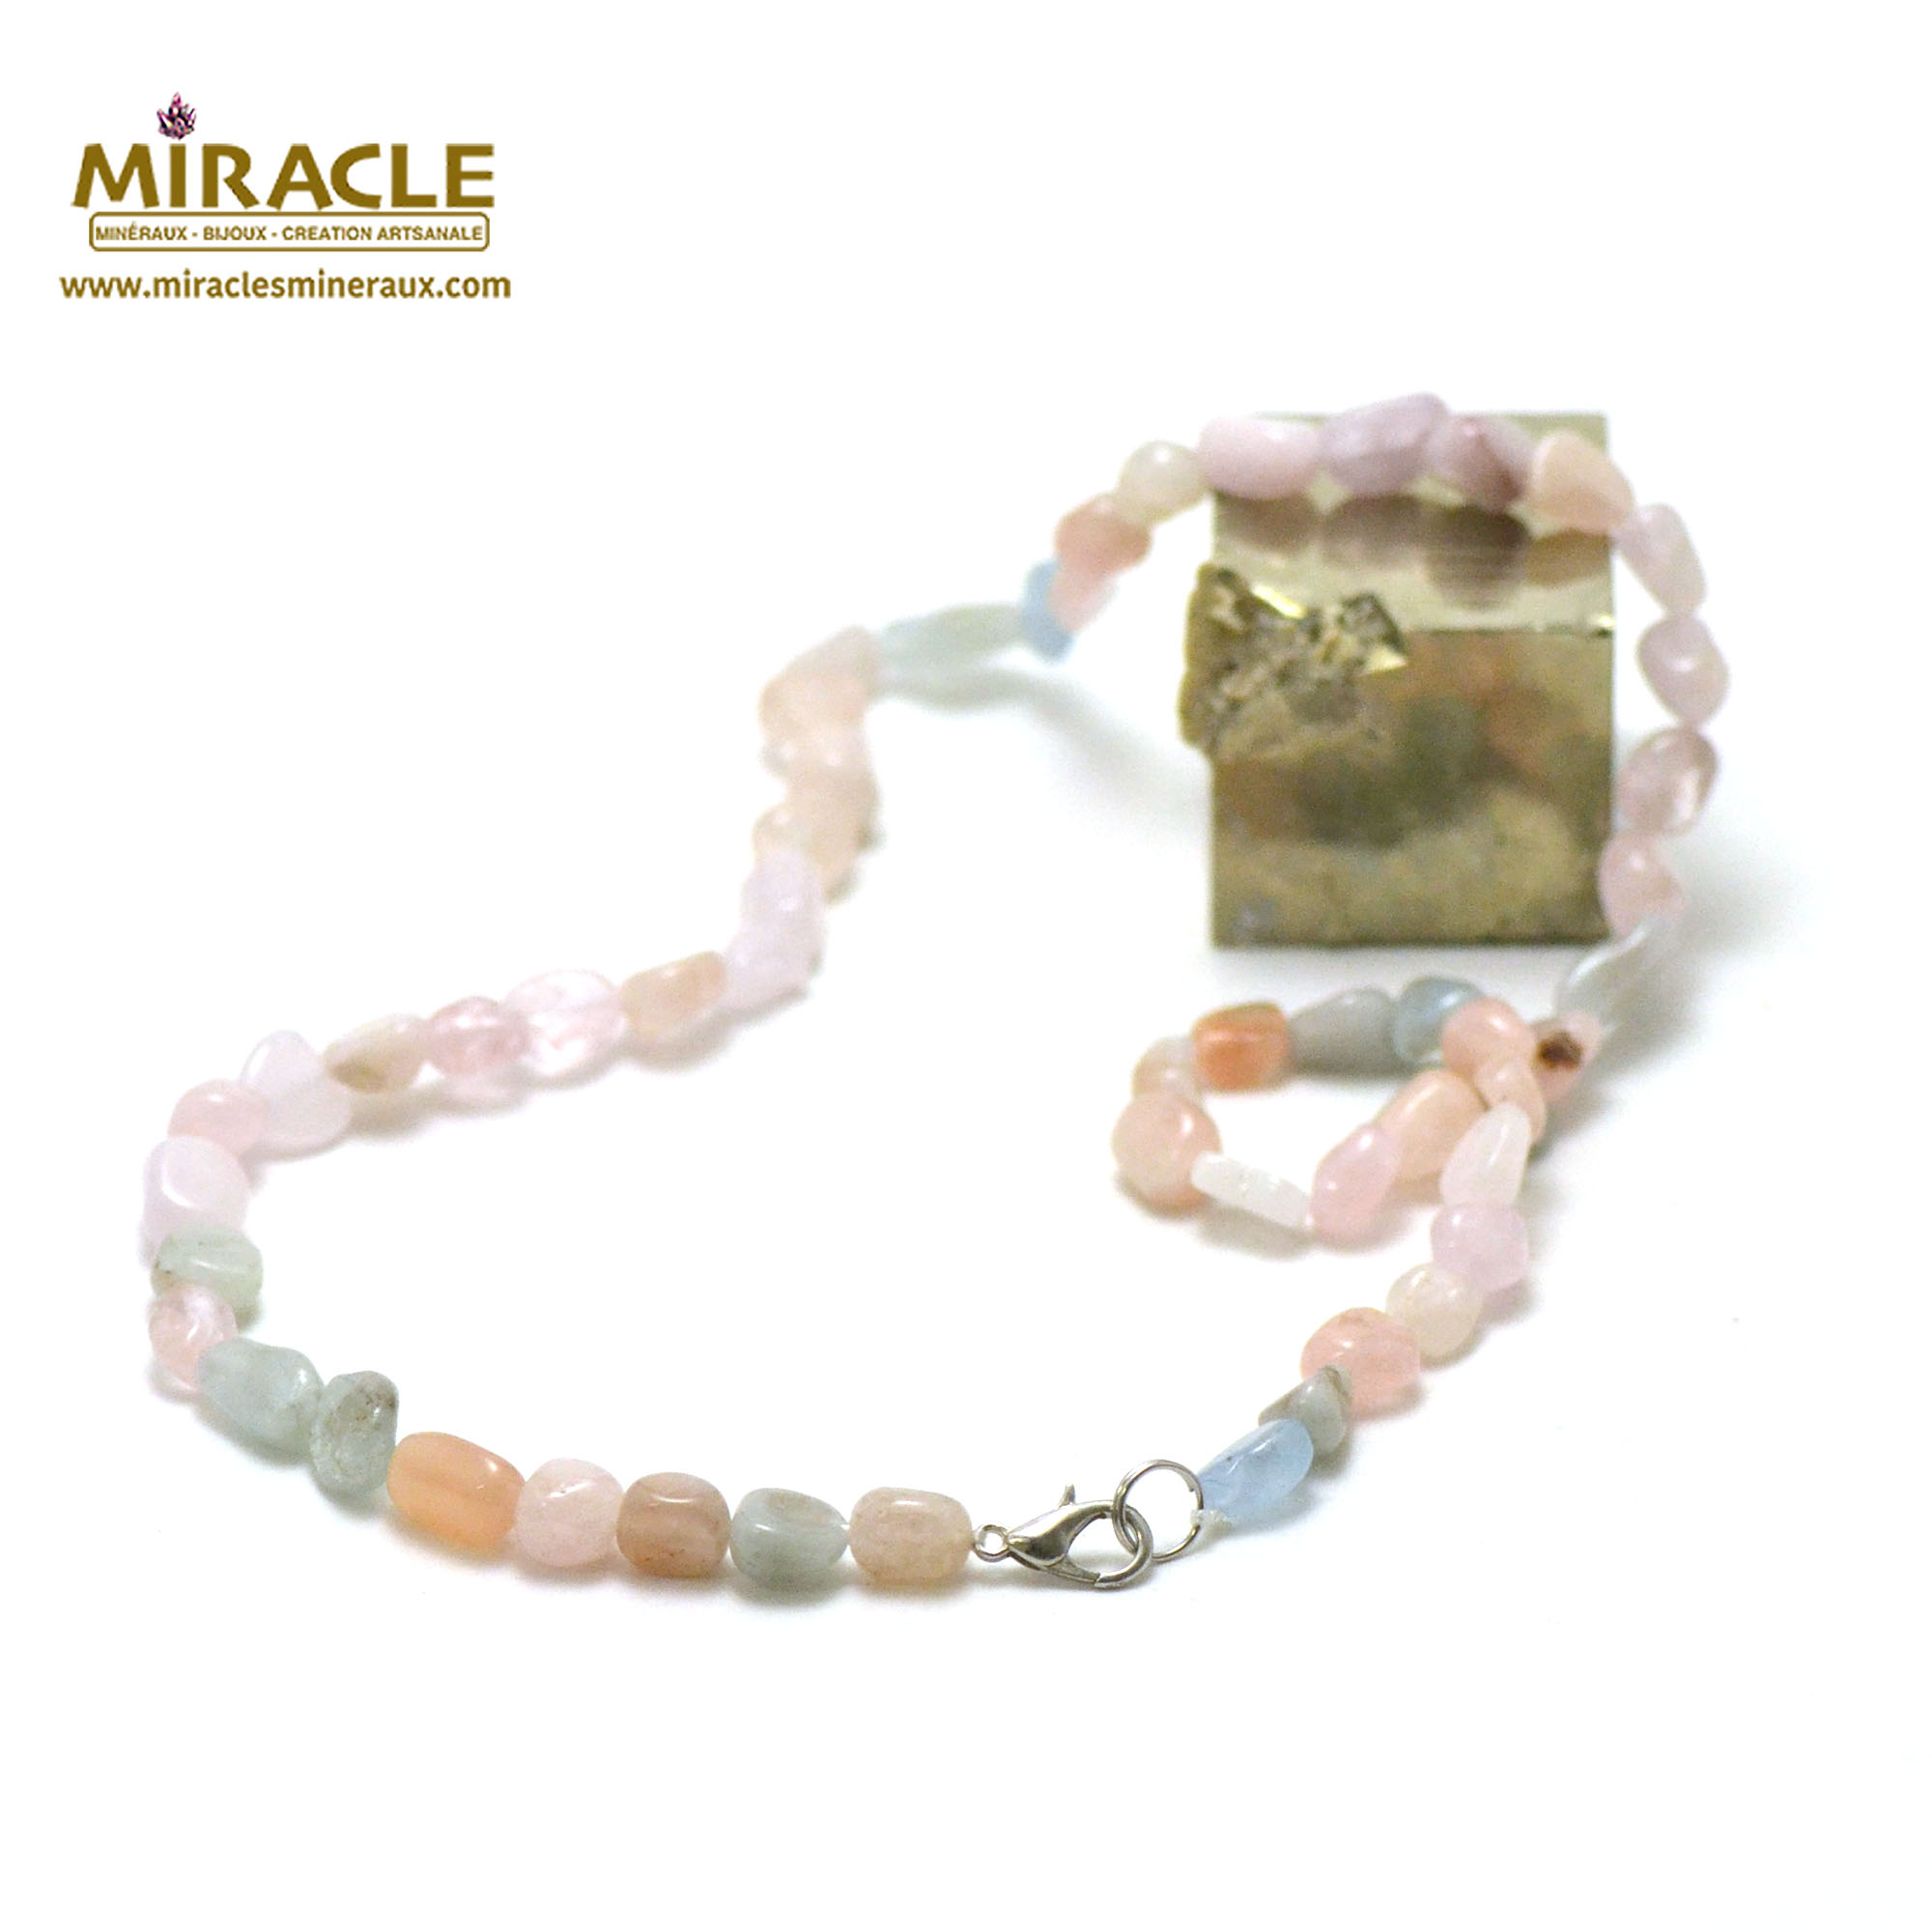 collier Béryl, morganite rose perle pierre roulée